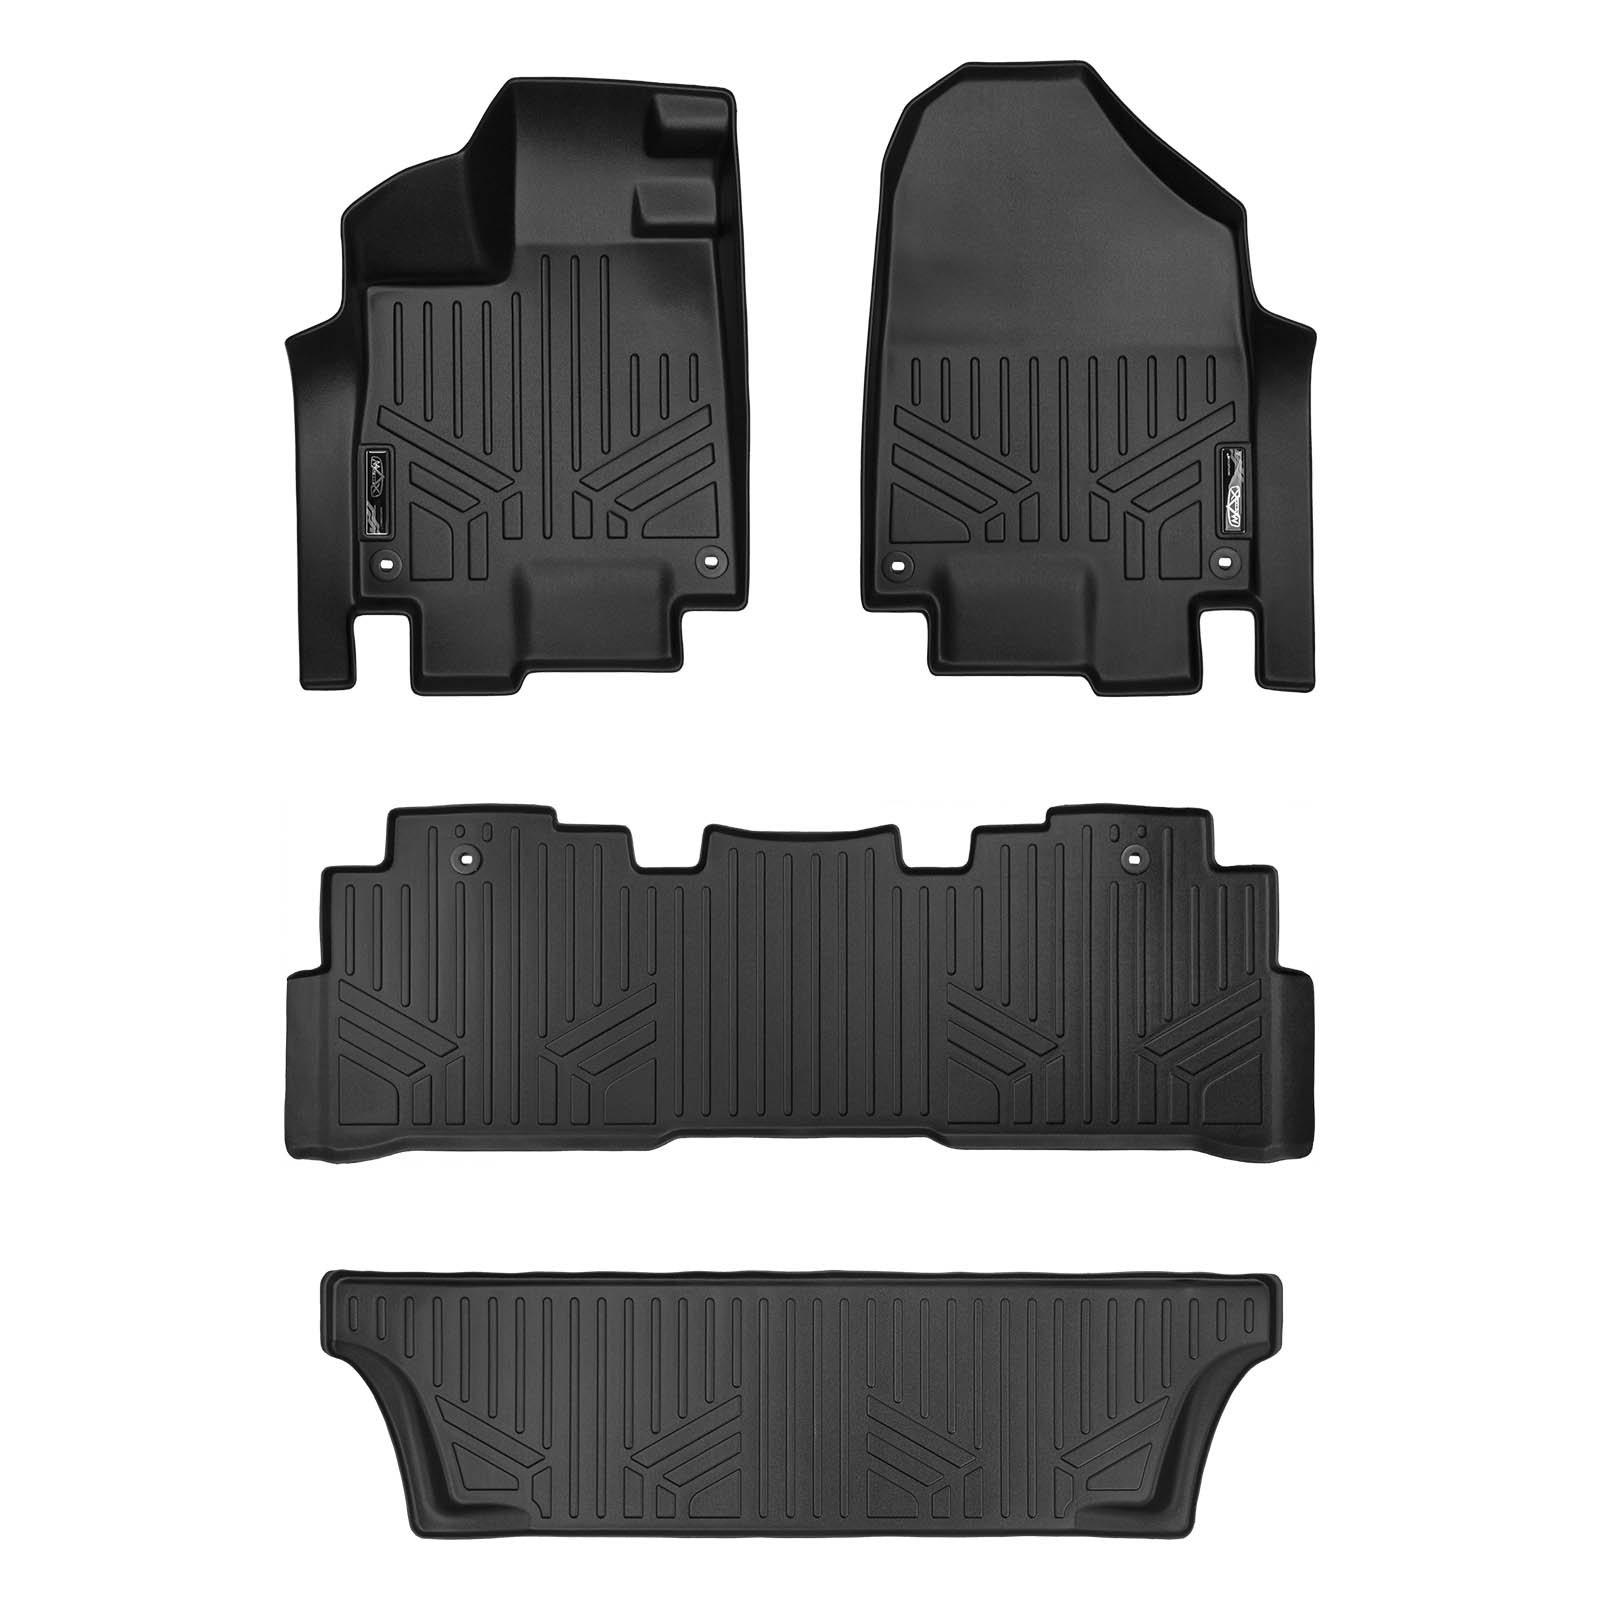 MAX LINER A0325/B0325/C0325 Custom Fit Floor Mats 3 Row Liner Set Black for 2018-2019 Honda Odyssey - All Models